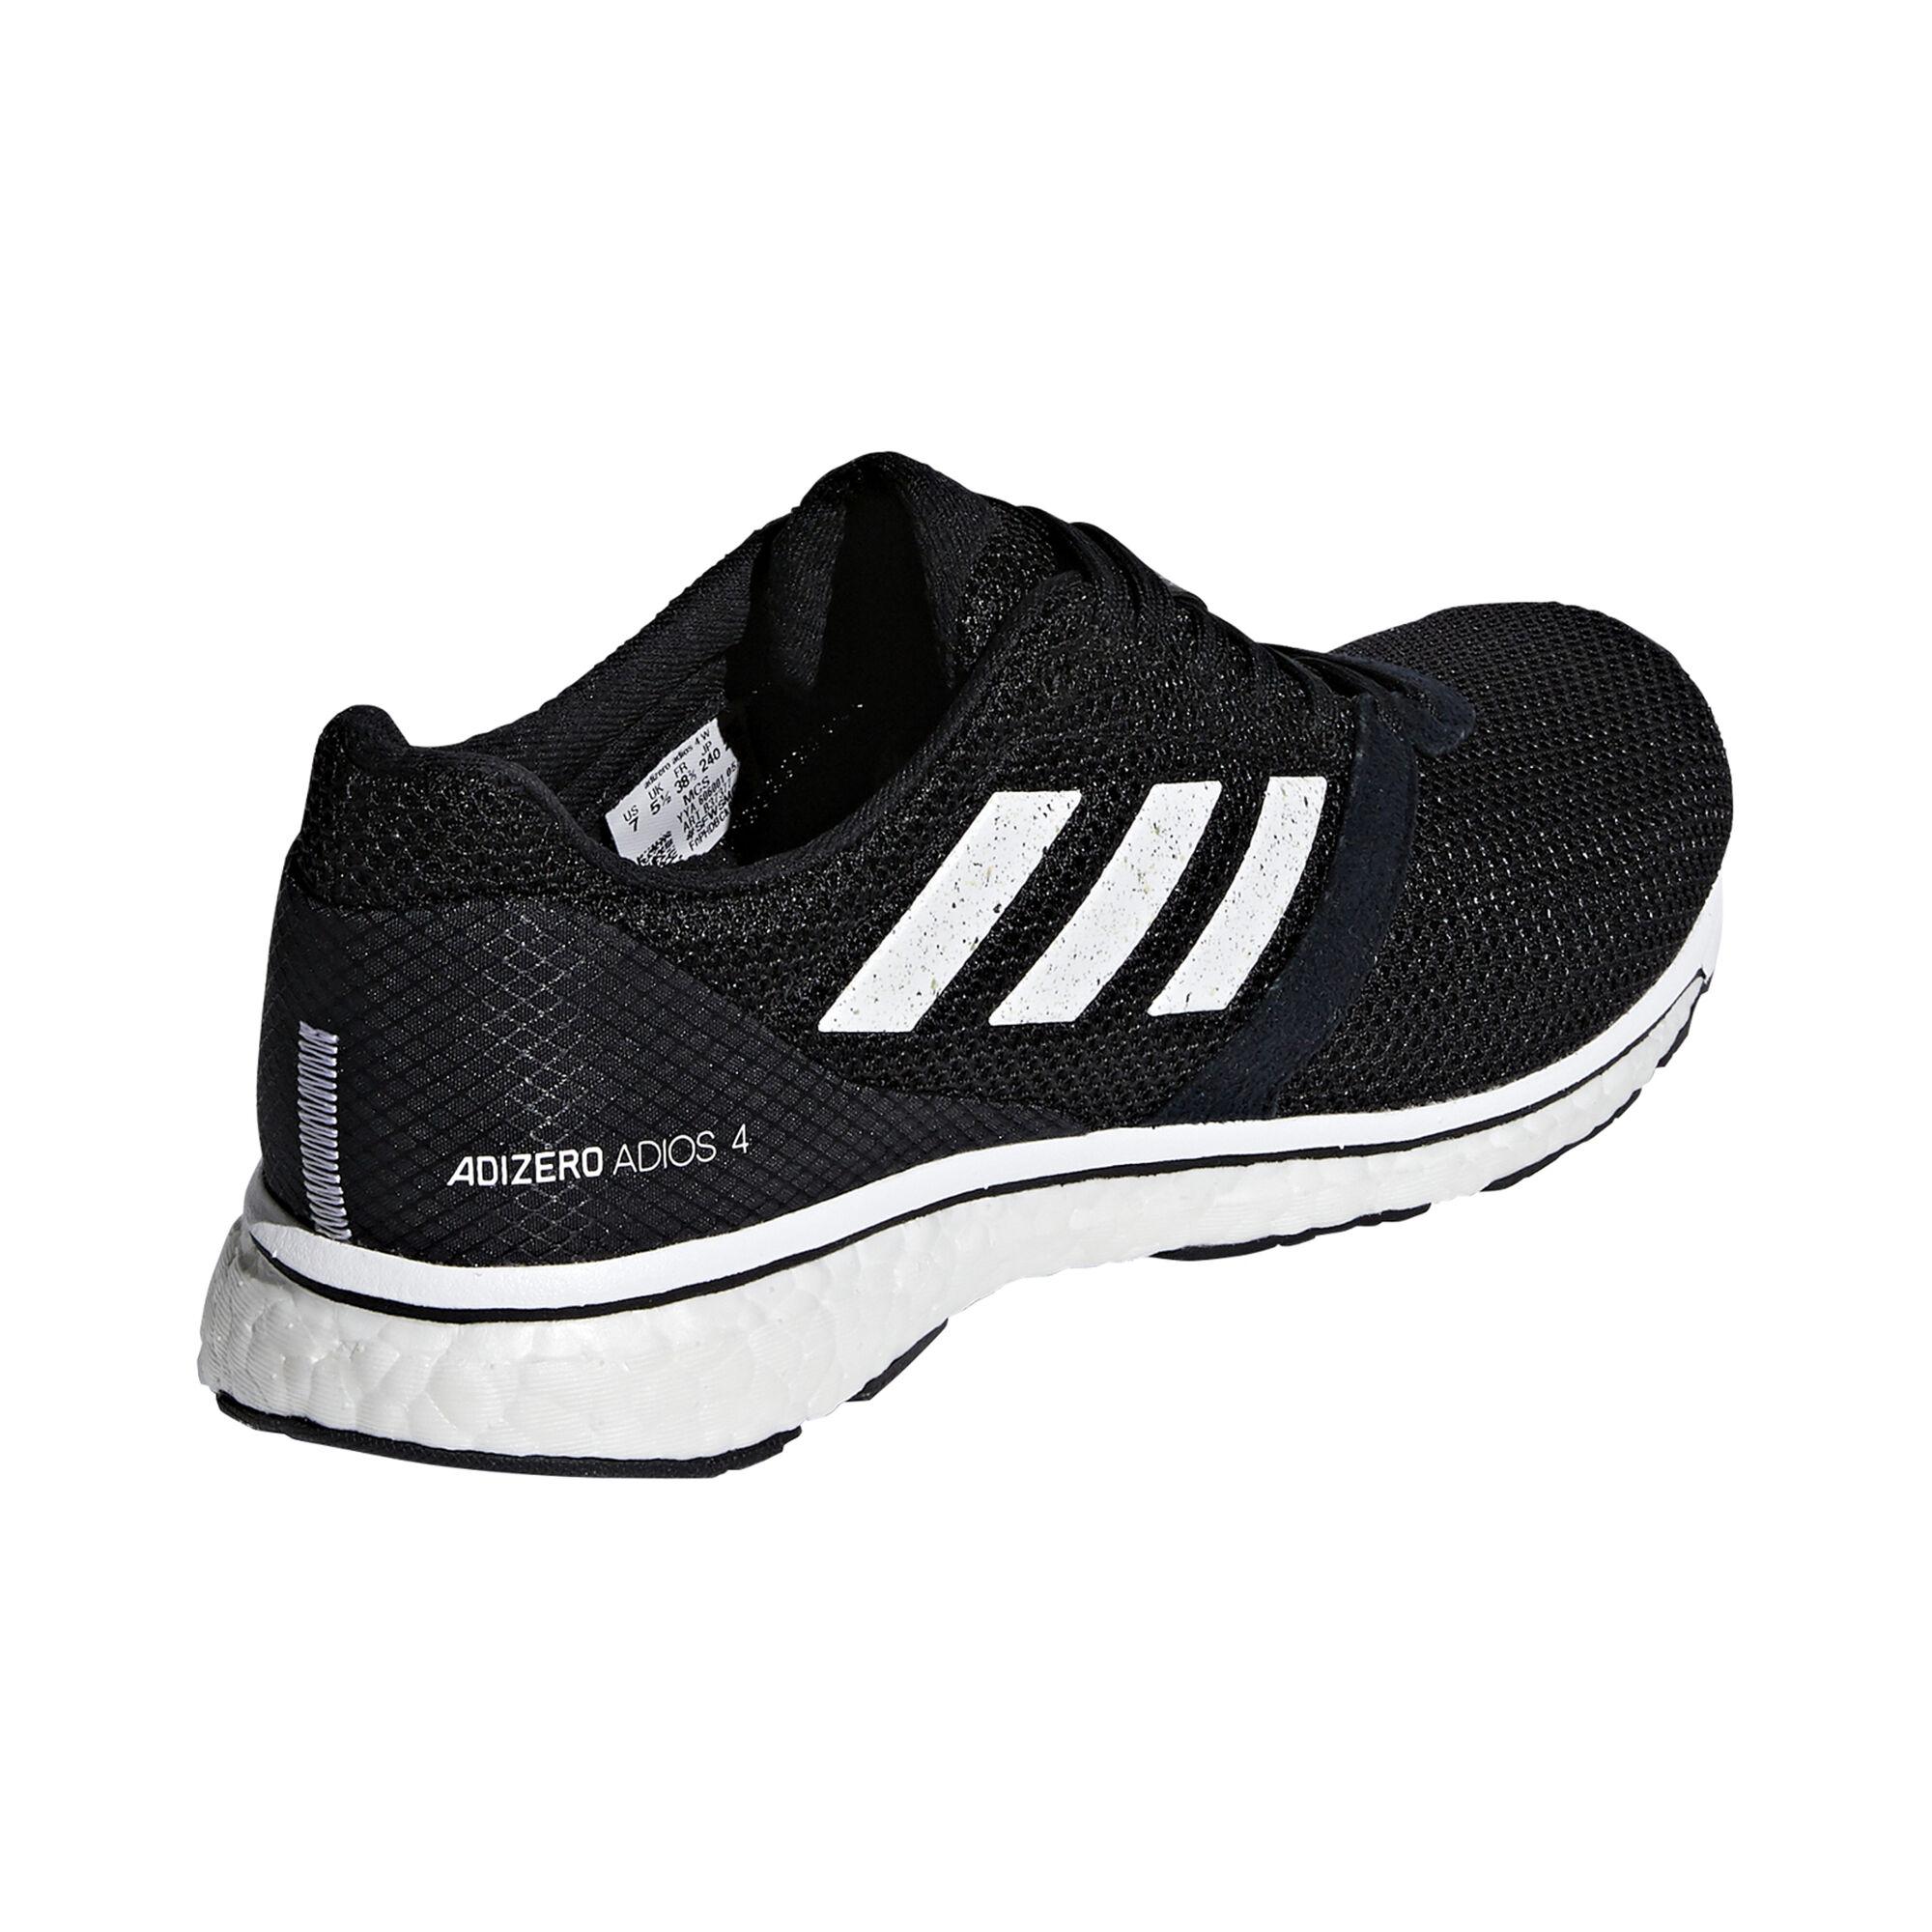 247321886767 ... adidas · adidas · adidas · adidas · adidas · adidas. Adizero Adios 4  Women ...